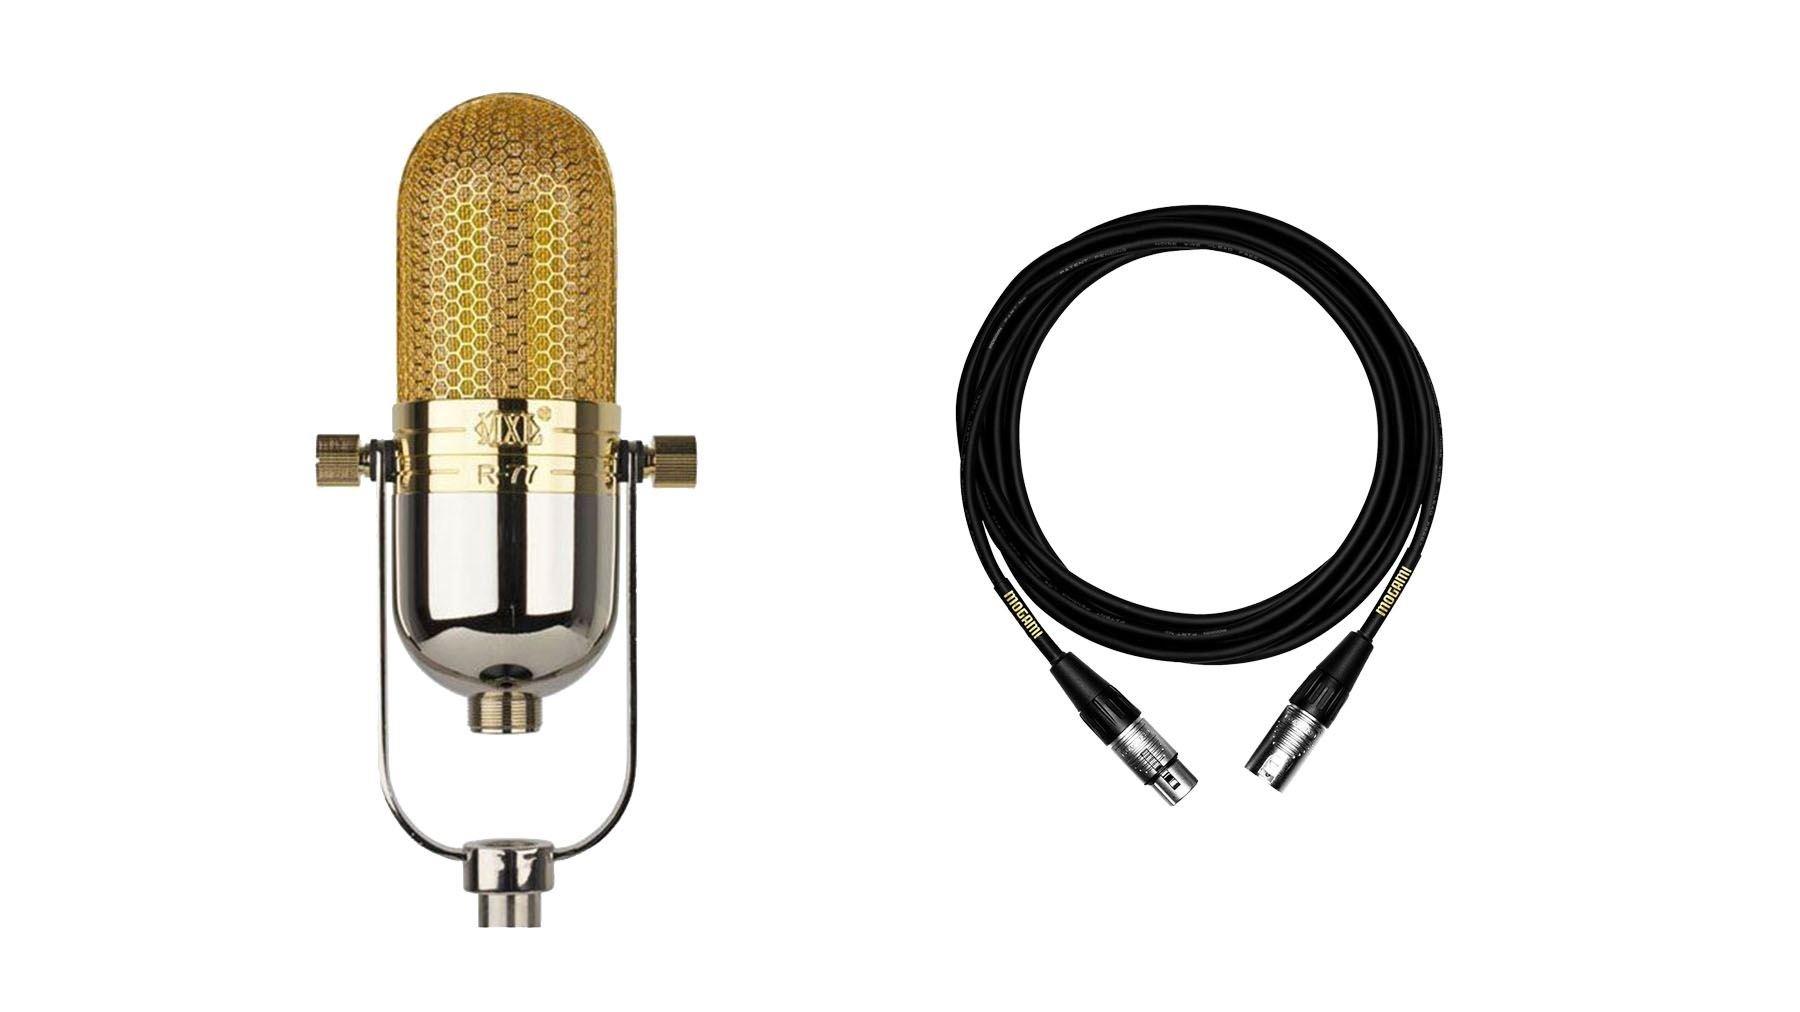 MXL R77 Microphone Bundle with Premium 15-foot XLR Mogami Cable (2 Items)